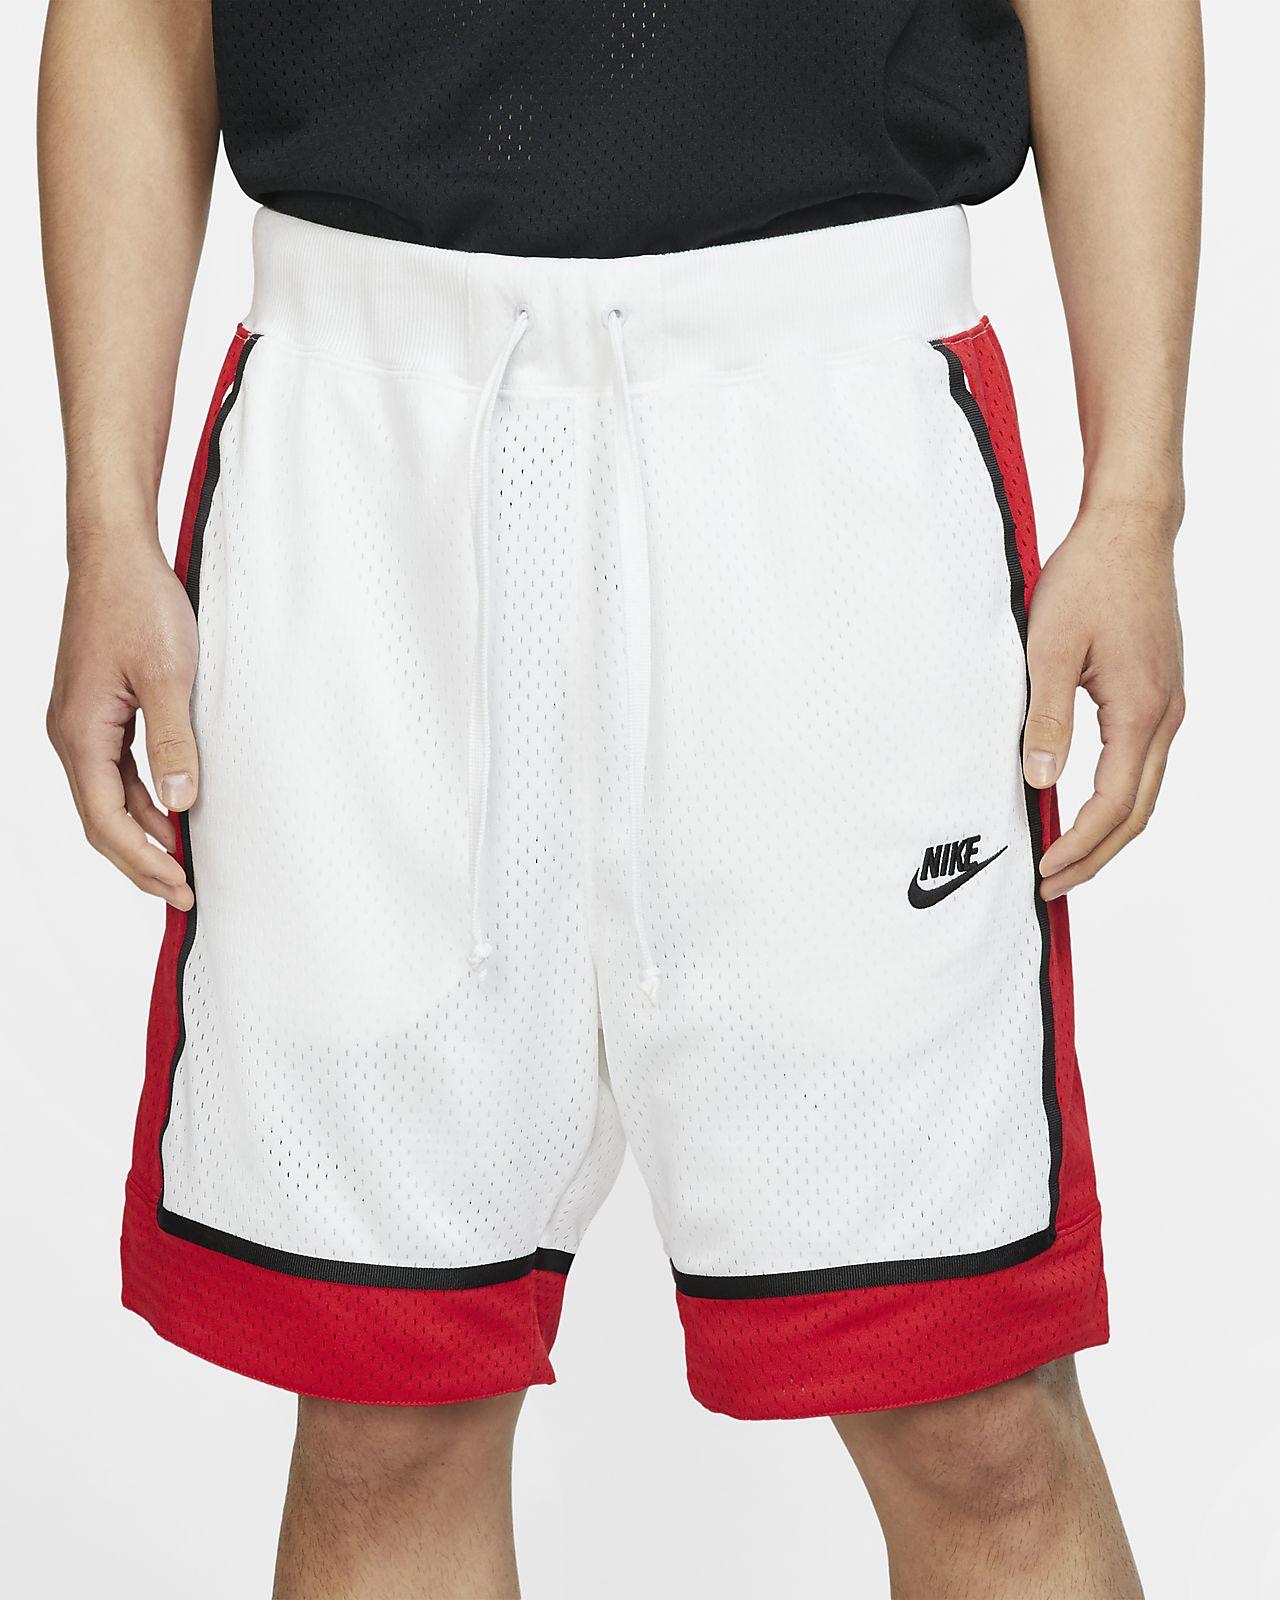 Nike Sportswear shorts i nettingmateriale for herre